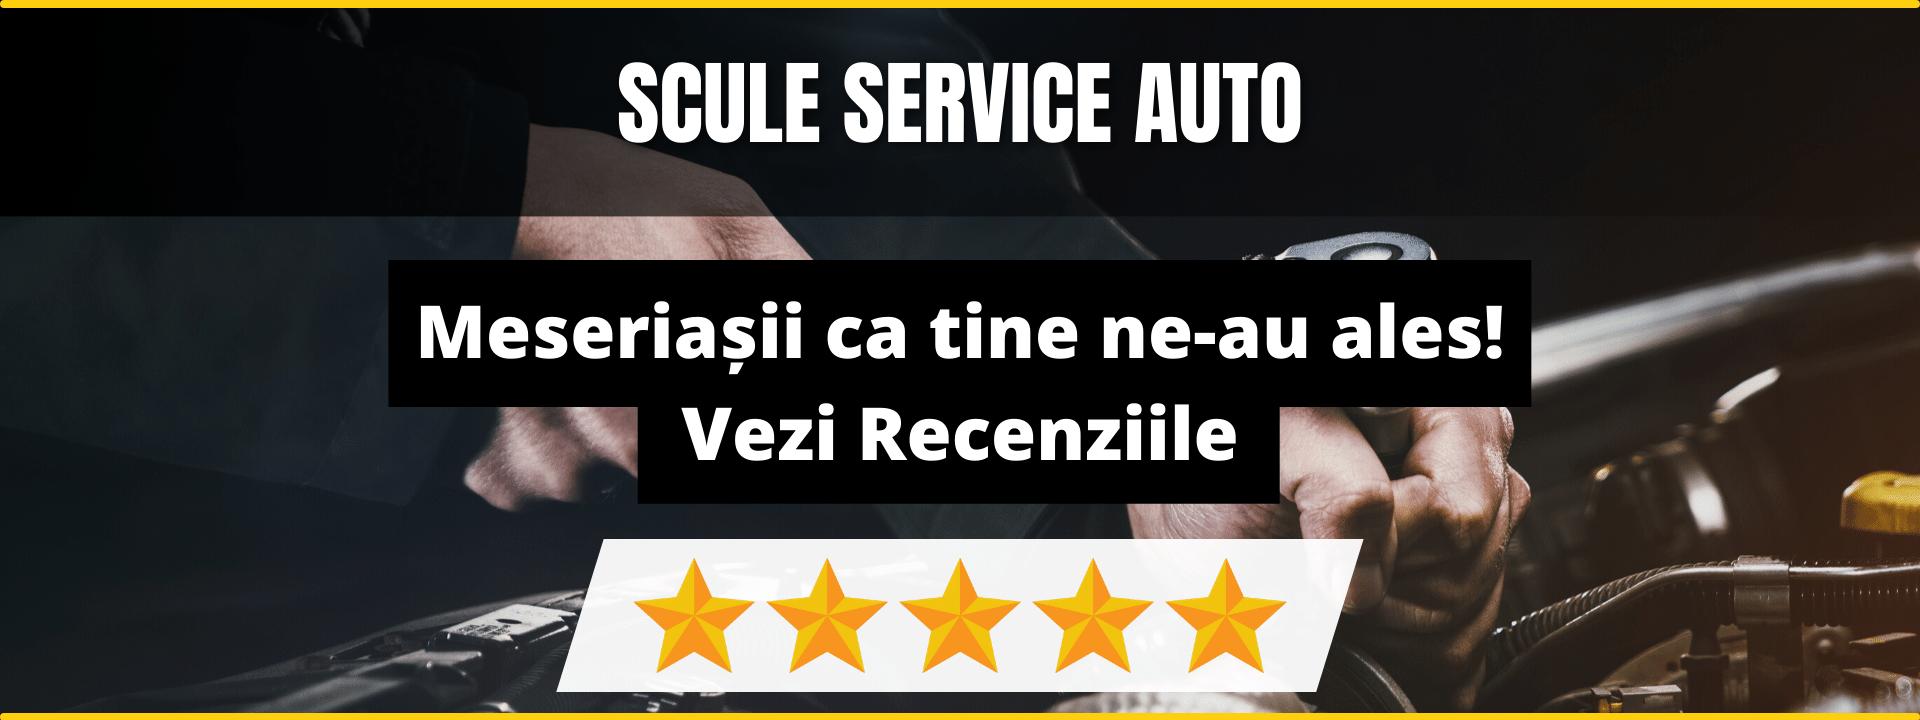 Baner categorie service auto - mobile